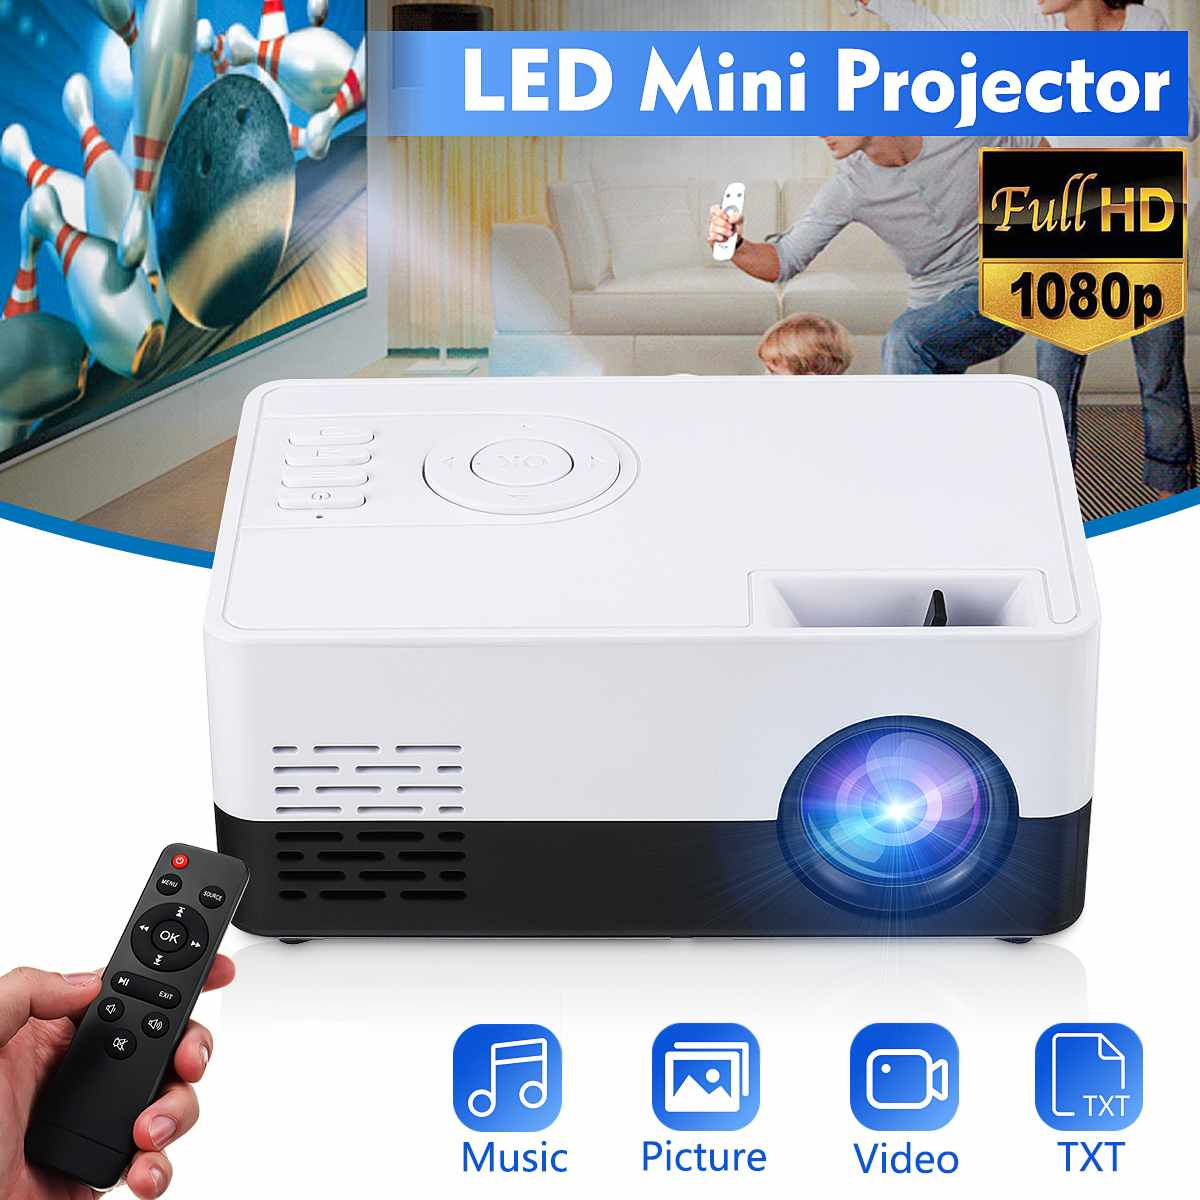 Mini proyector de teléfono HD con bluetooth, WIFI, proyector LED portátil, cine en casa, cine al aire libre, película para fiesta, Camping